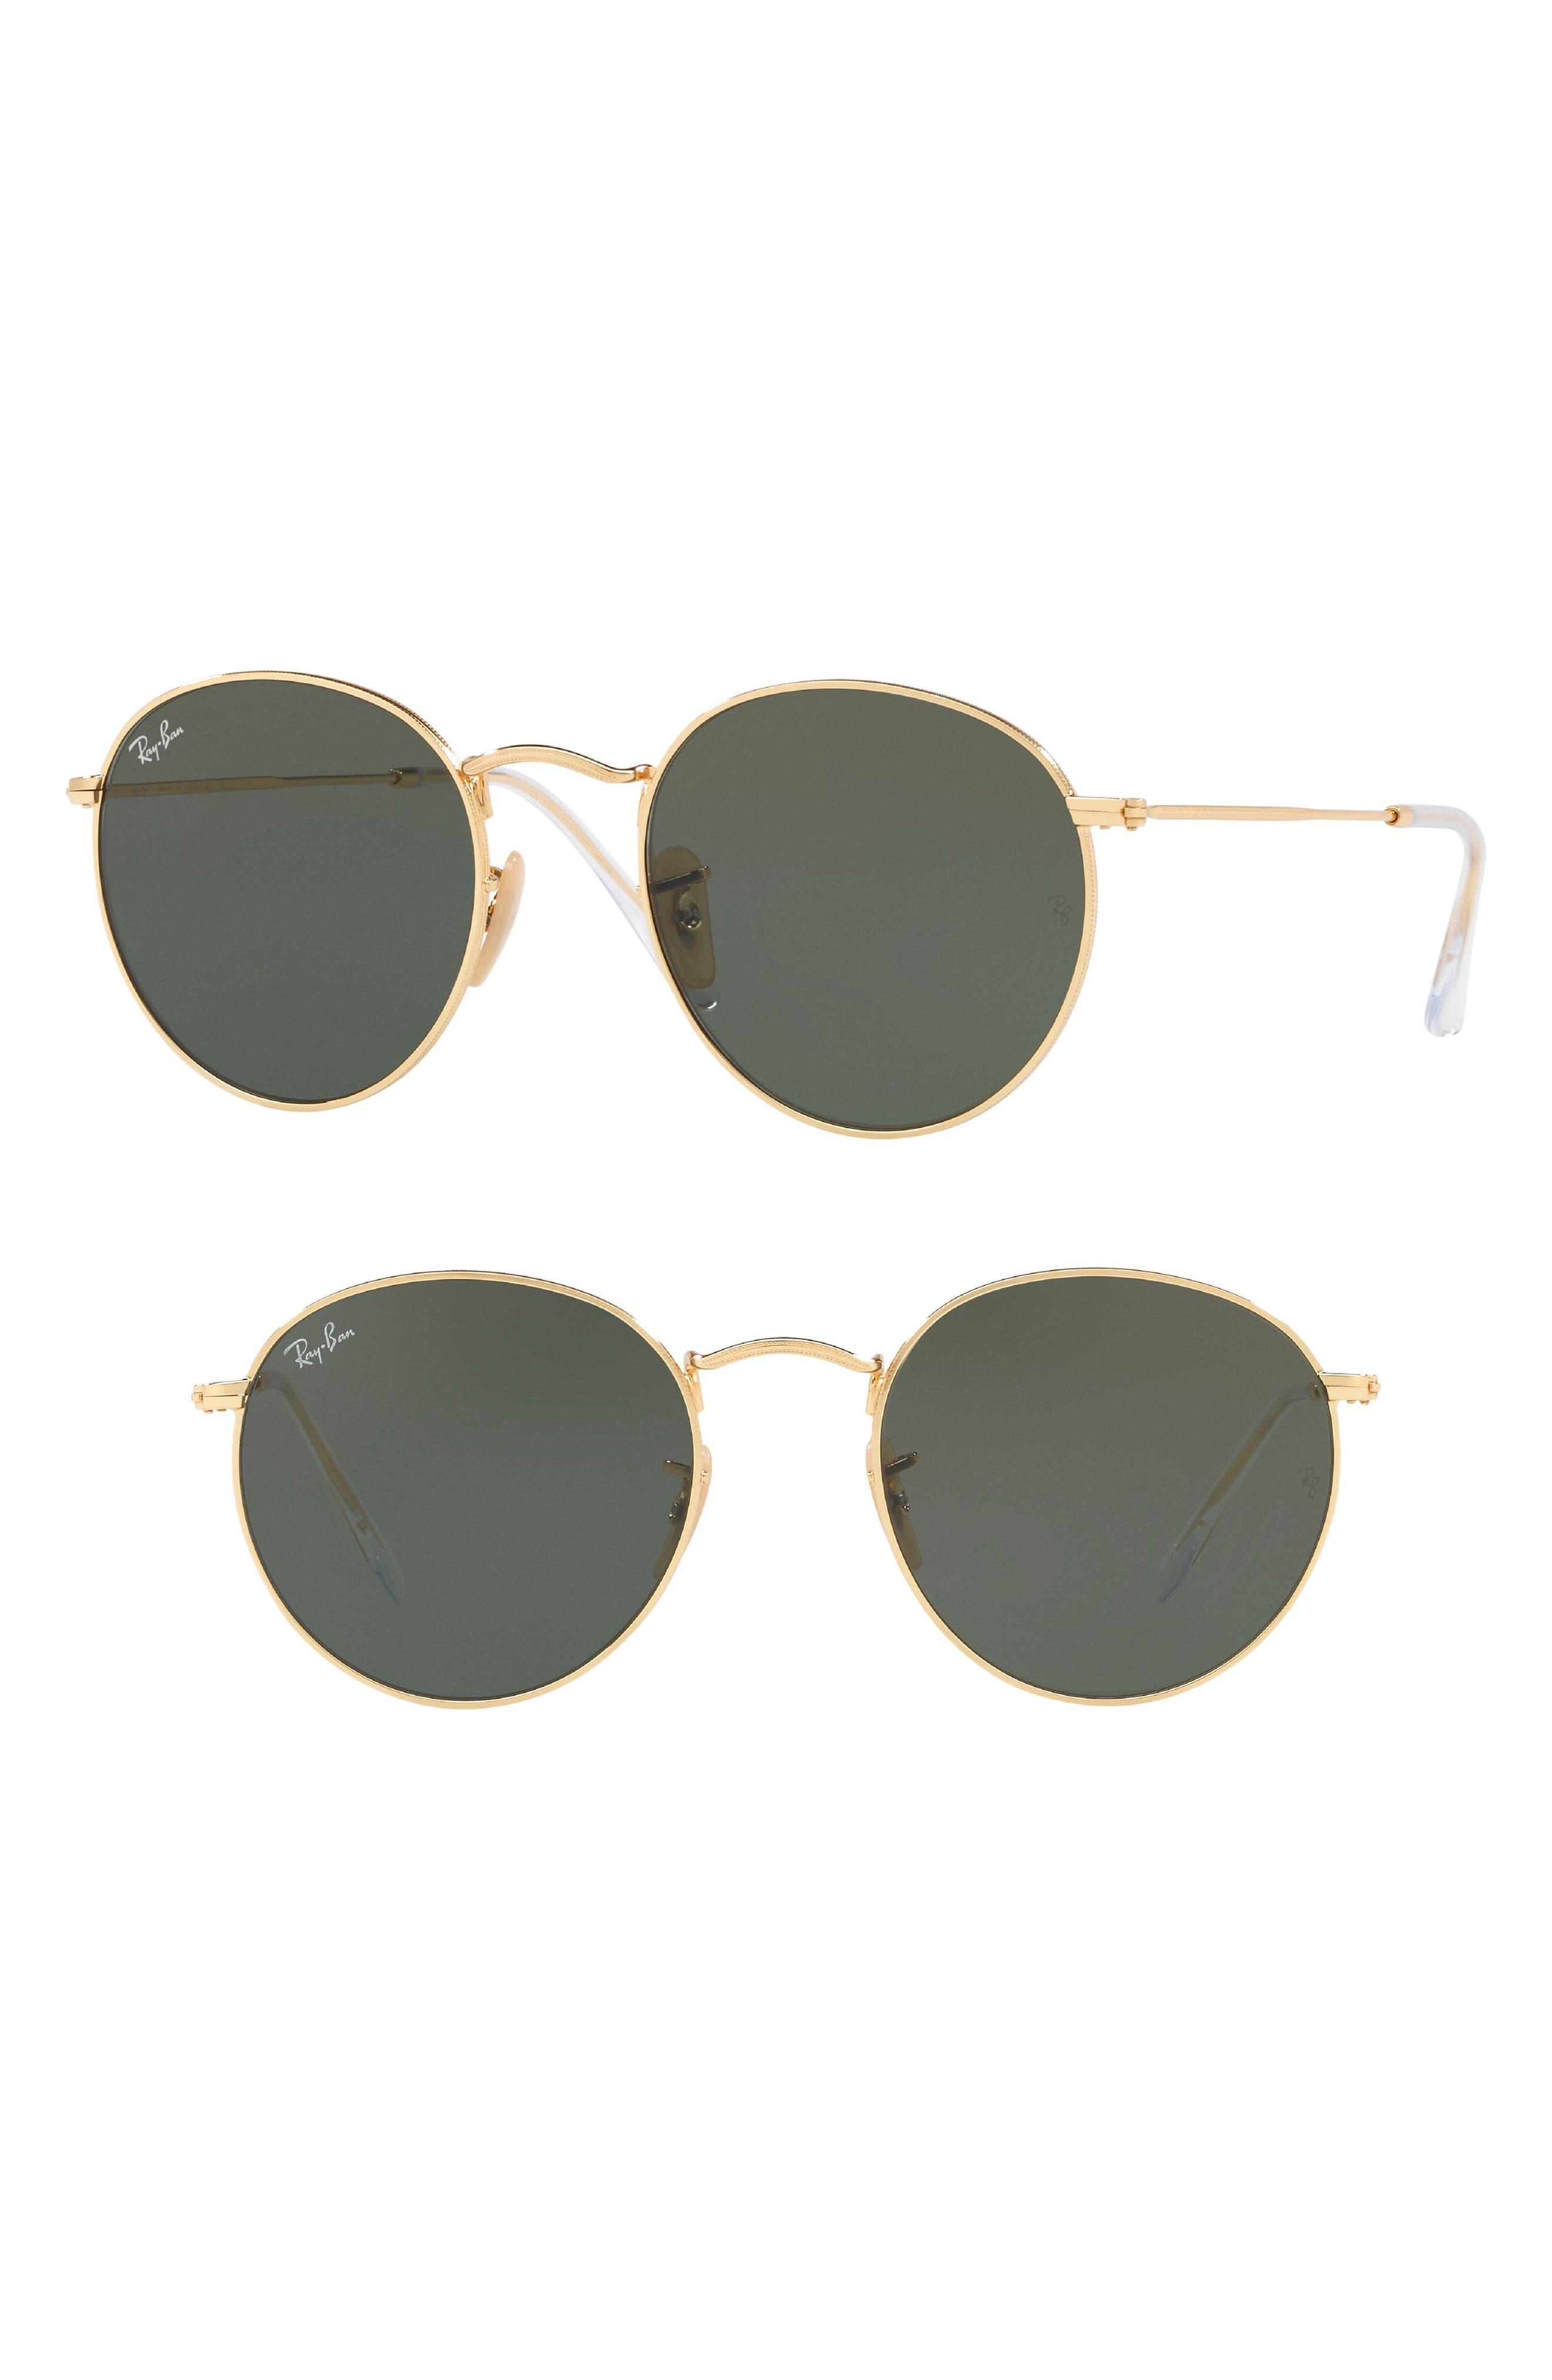 Ray-Ban Phantos 50Mm Round Sunglasses - Crystal Green